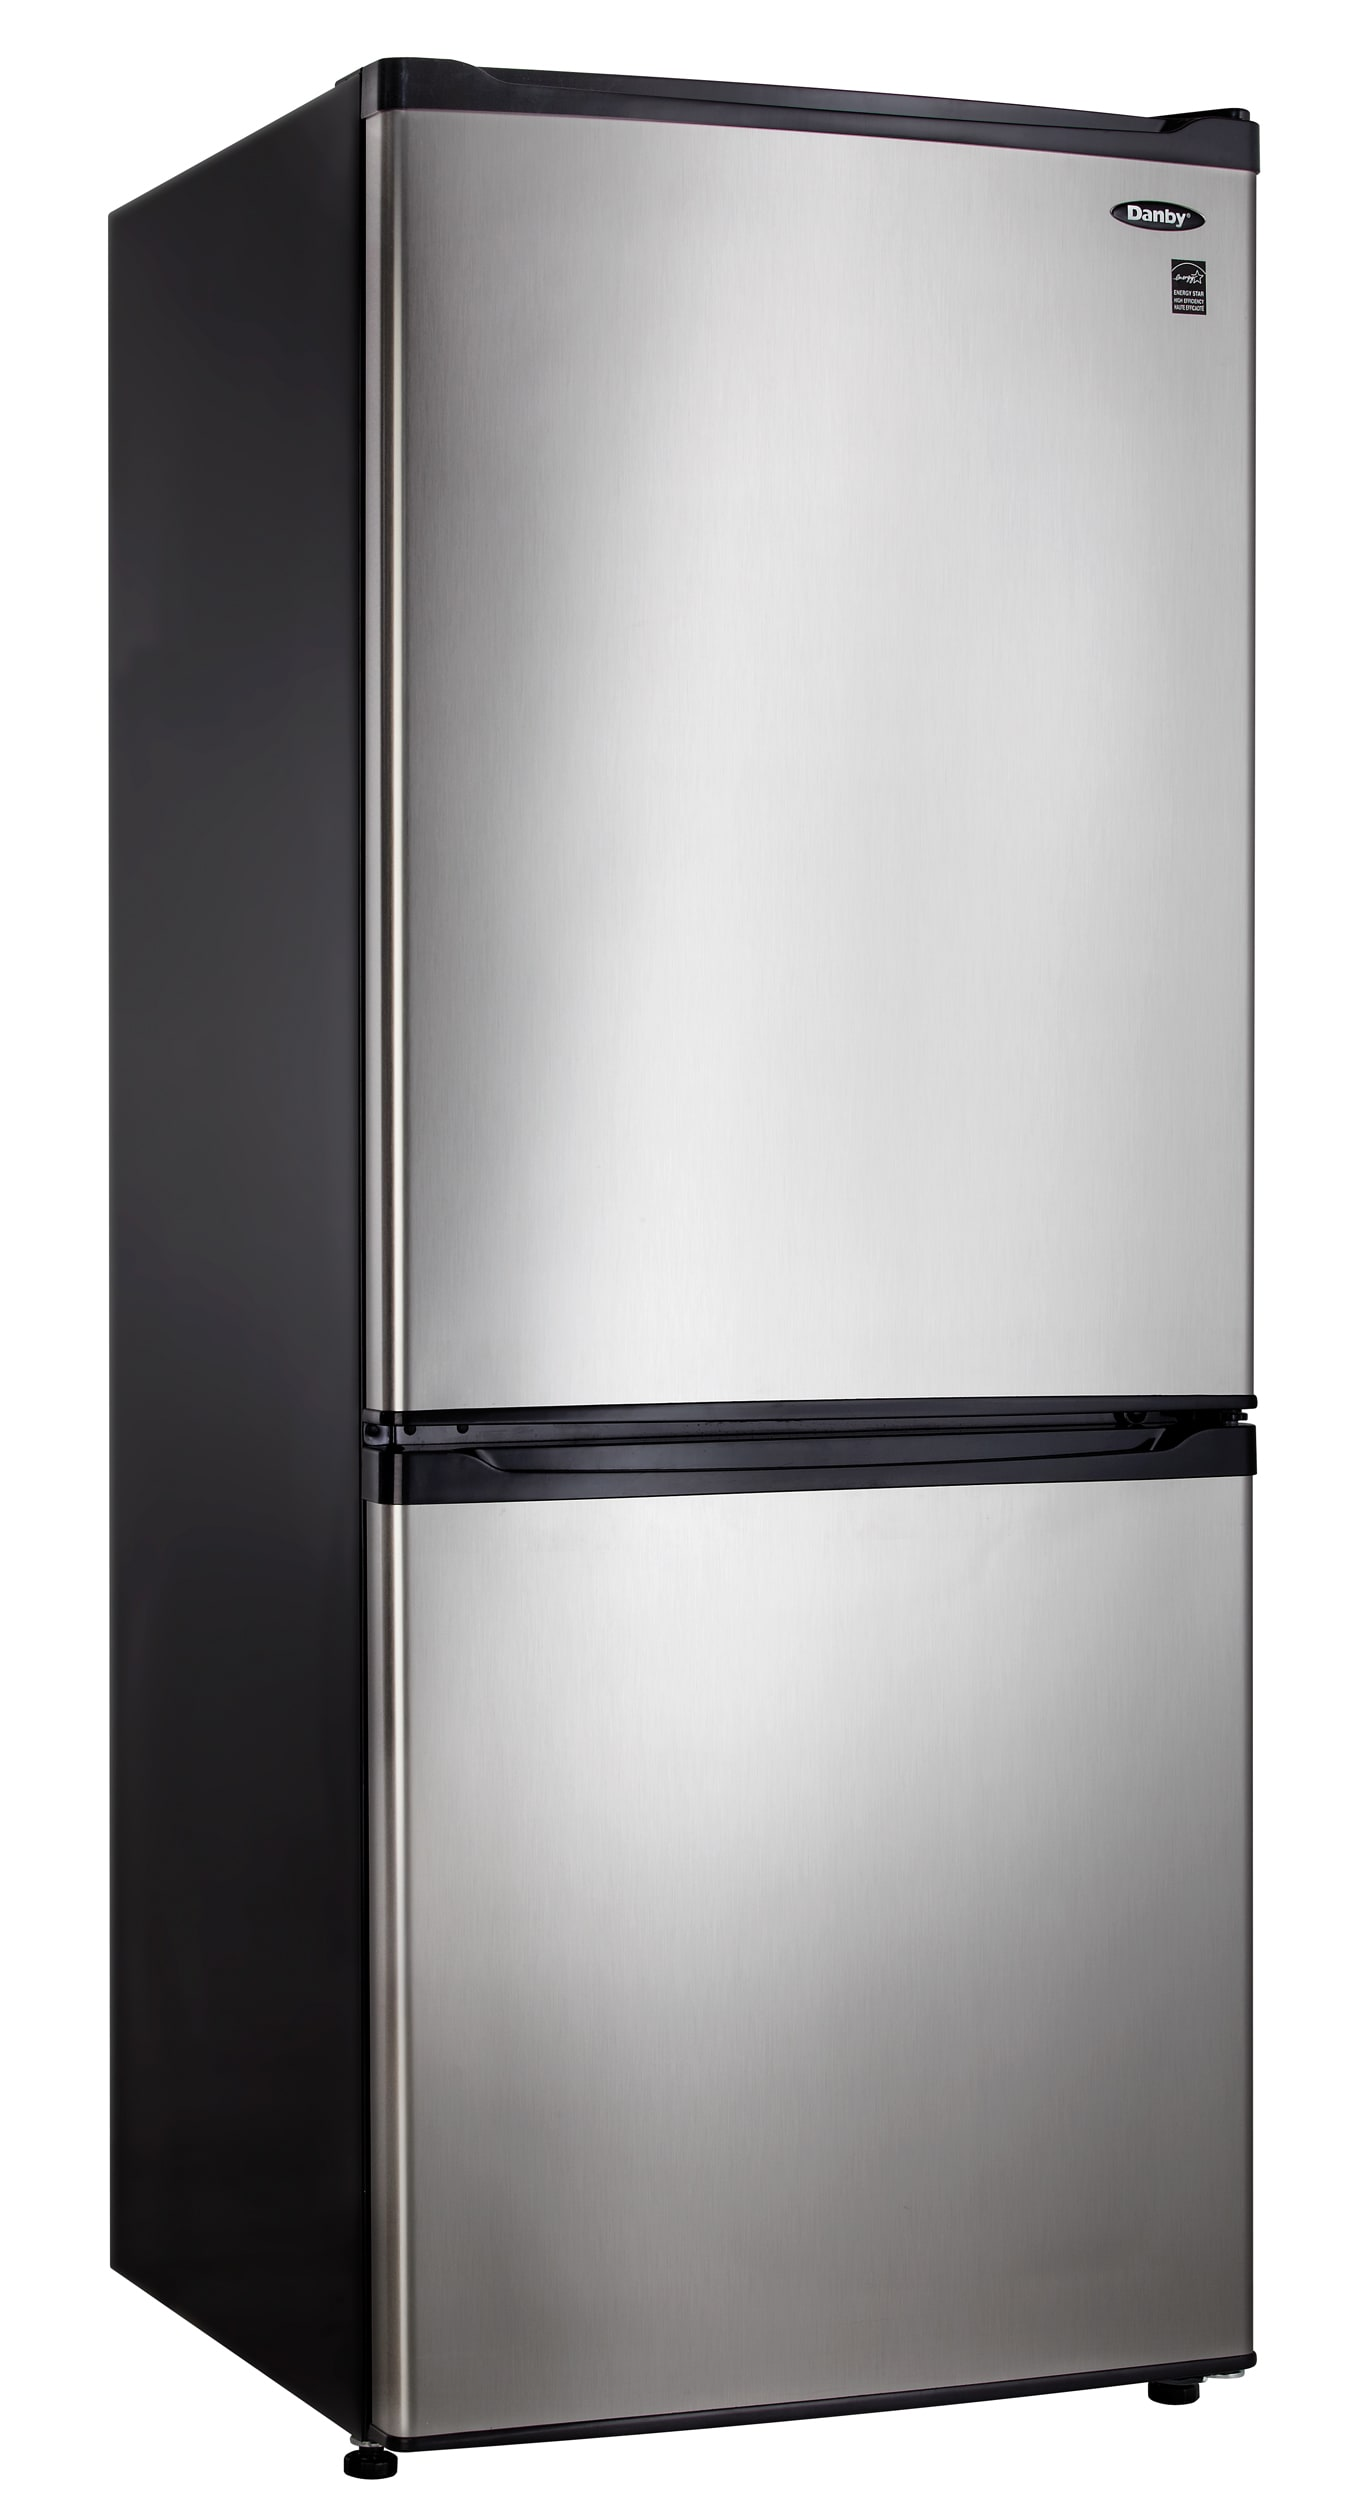 Apartment Refrigerator Models | Apartment-Size Refrigerator Reviews